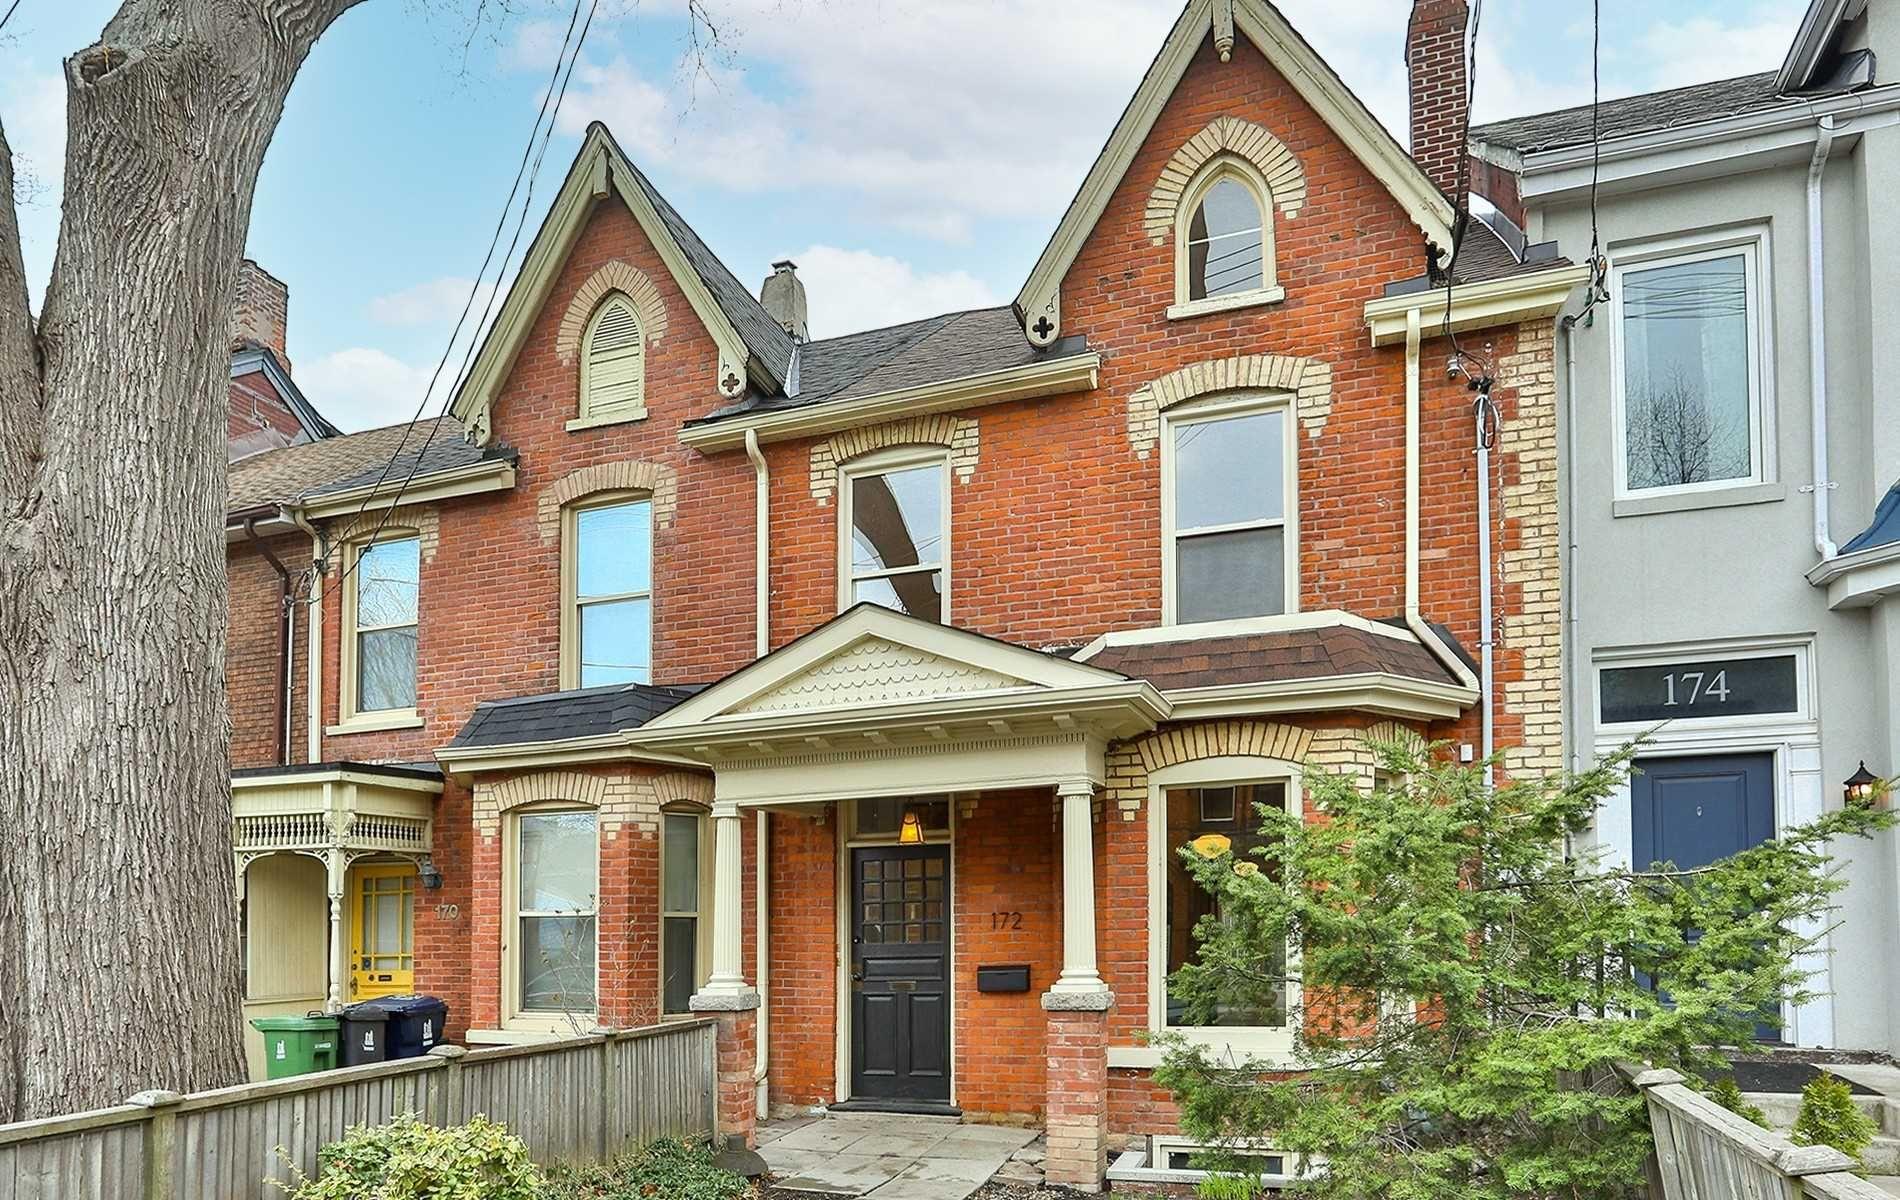 Main Photo: 172 Strachan Avenue in Toronto: Niagara House (2 1/2 Storey) for sale (Toronto C01)  : MLS®# C5192096